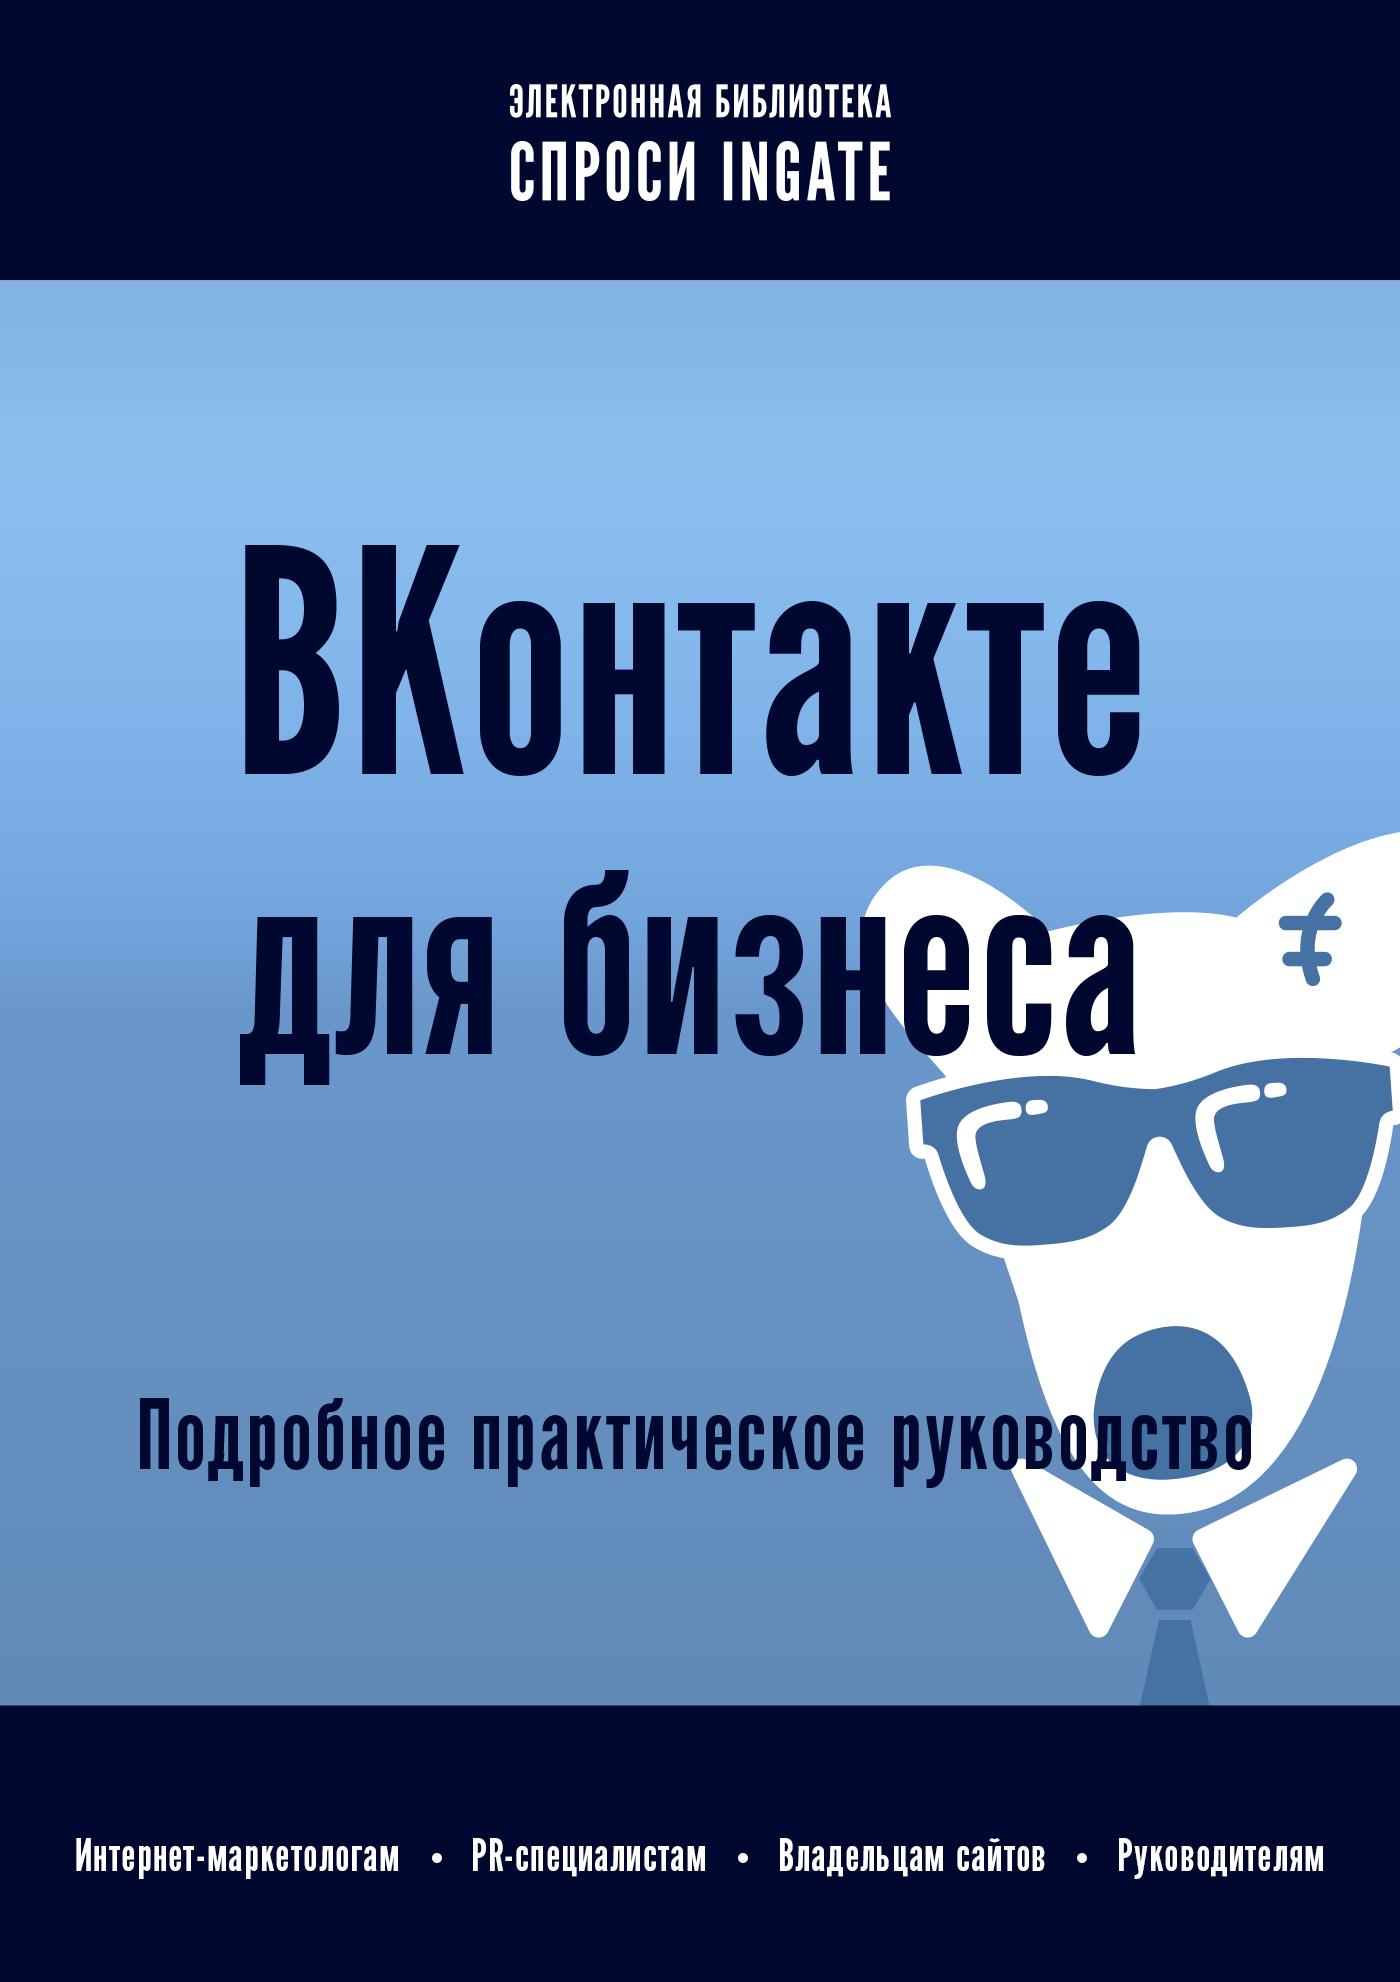 ВКонтакте.png